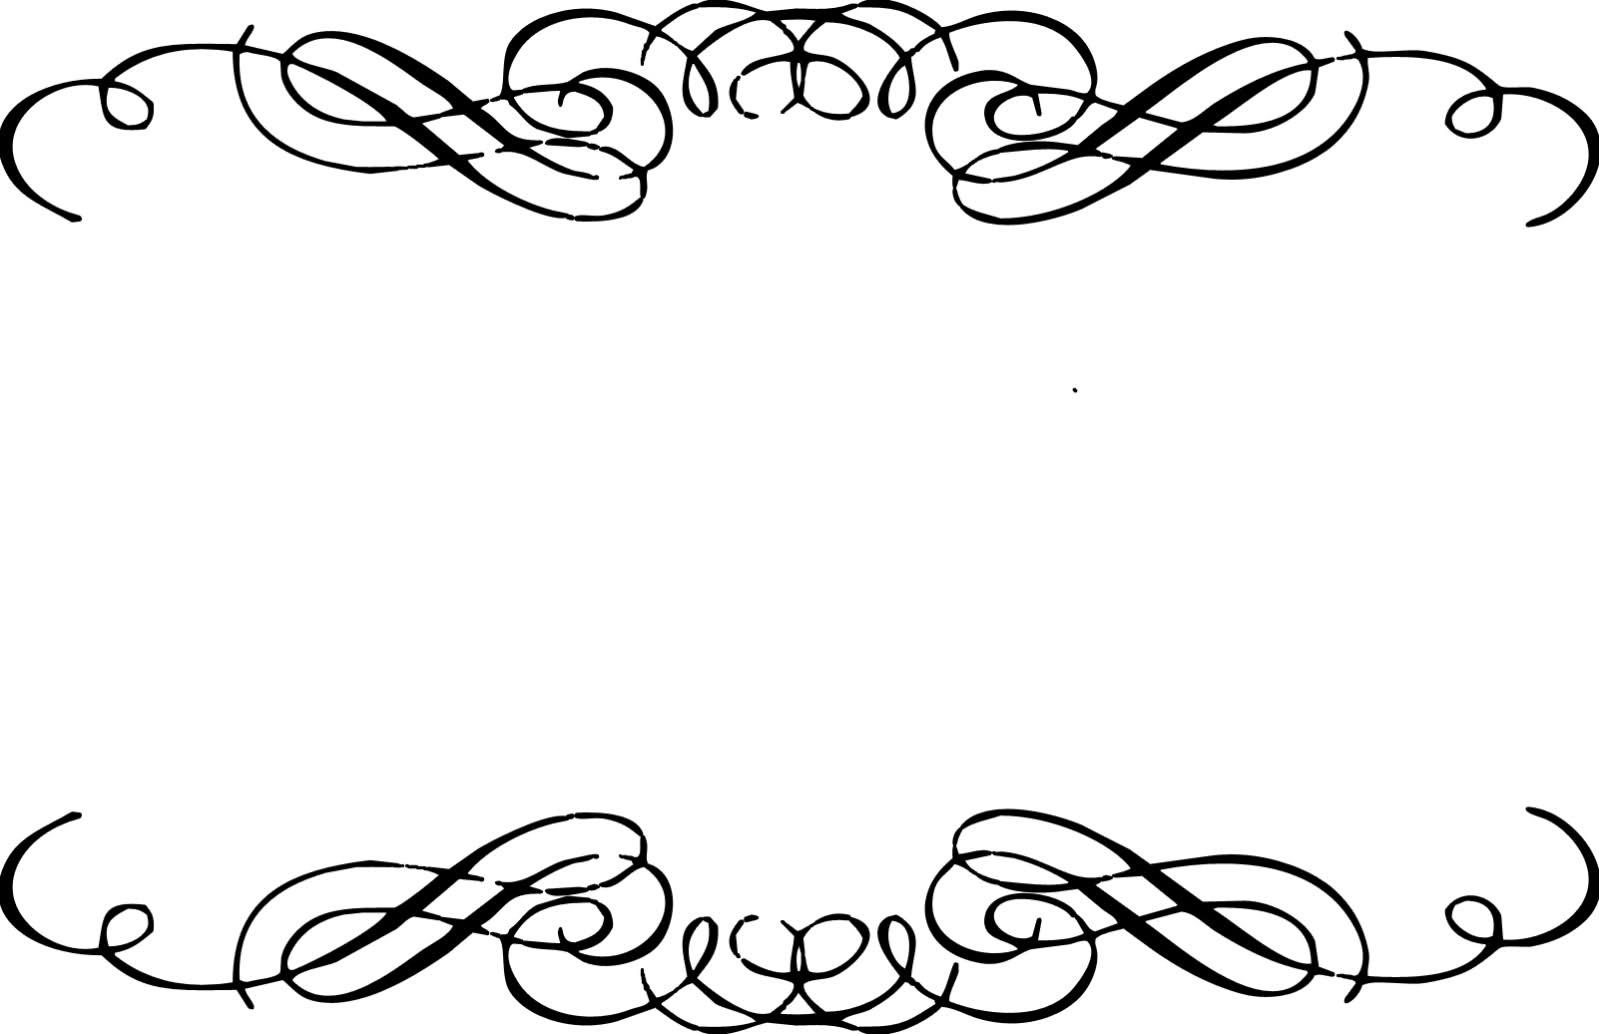 Line Art Design Free Download : Flourish line clipart suggest